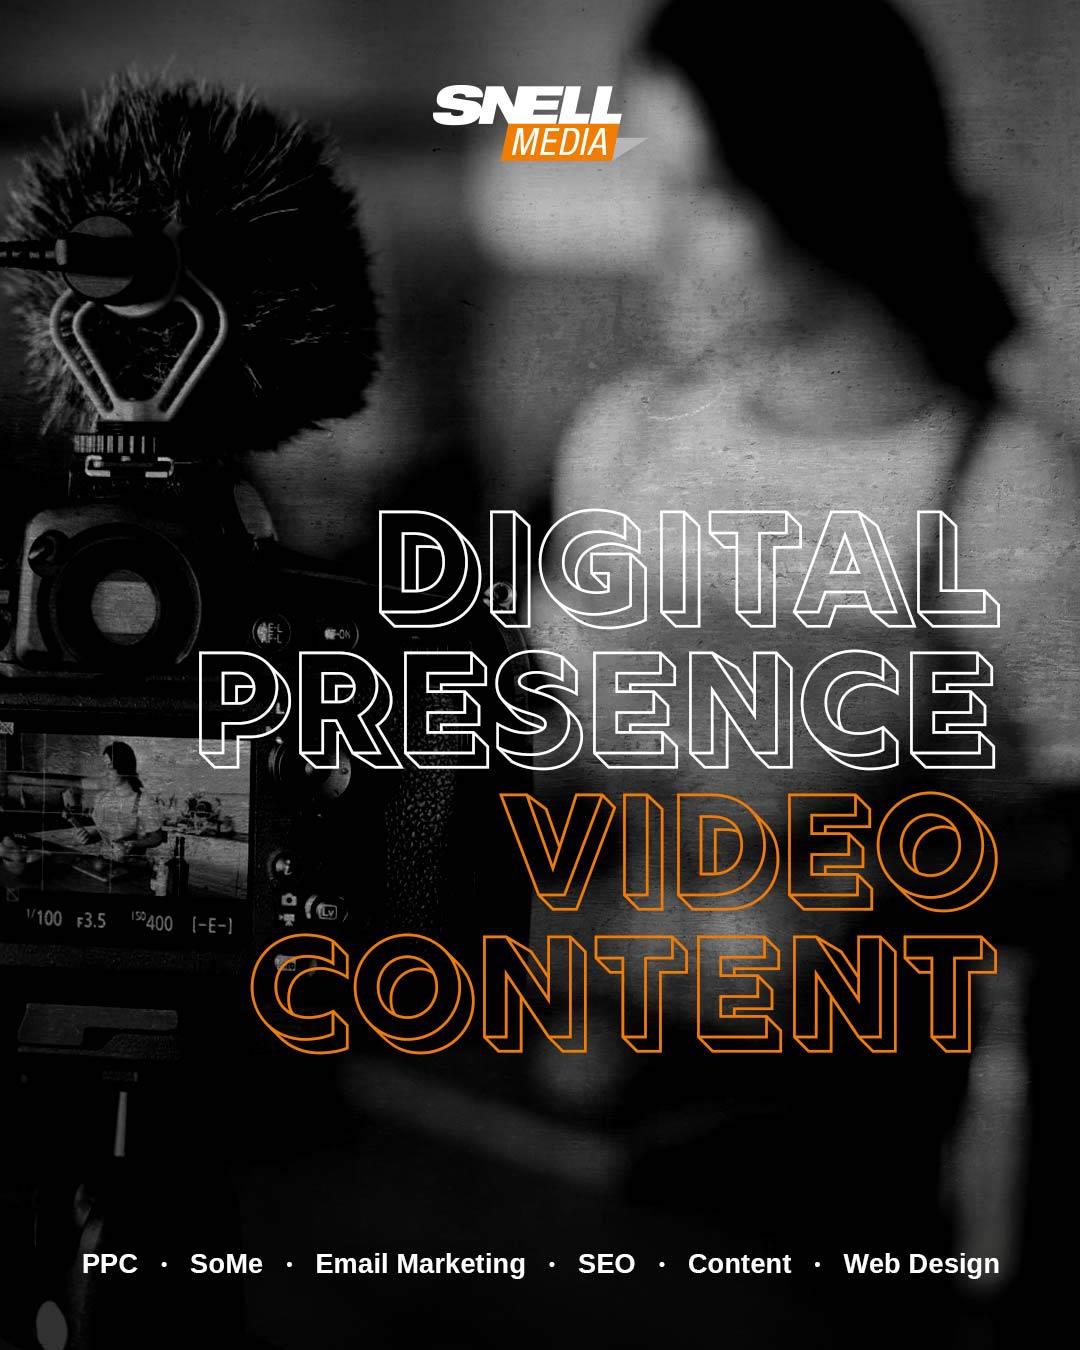 Digital Presence with Video 10th B2B Digital Marketing Trend